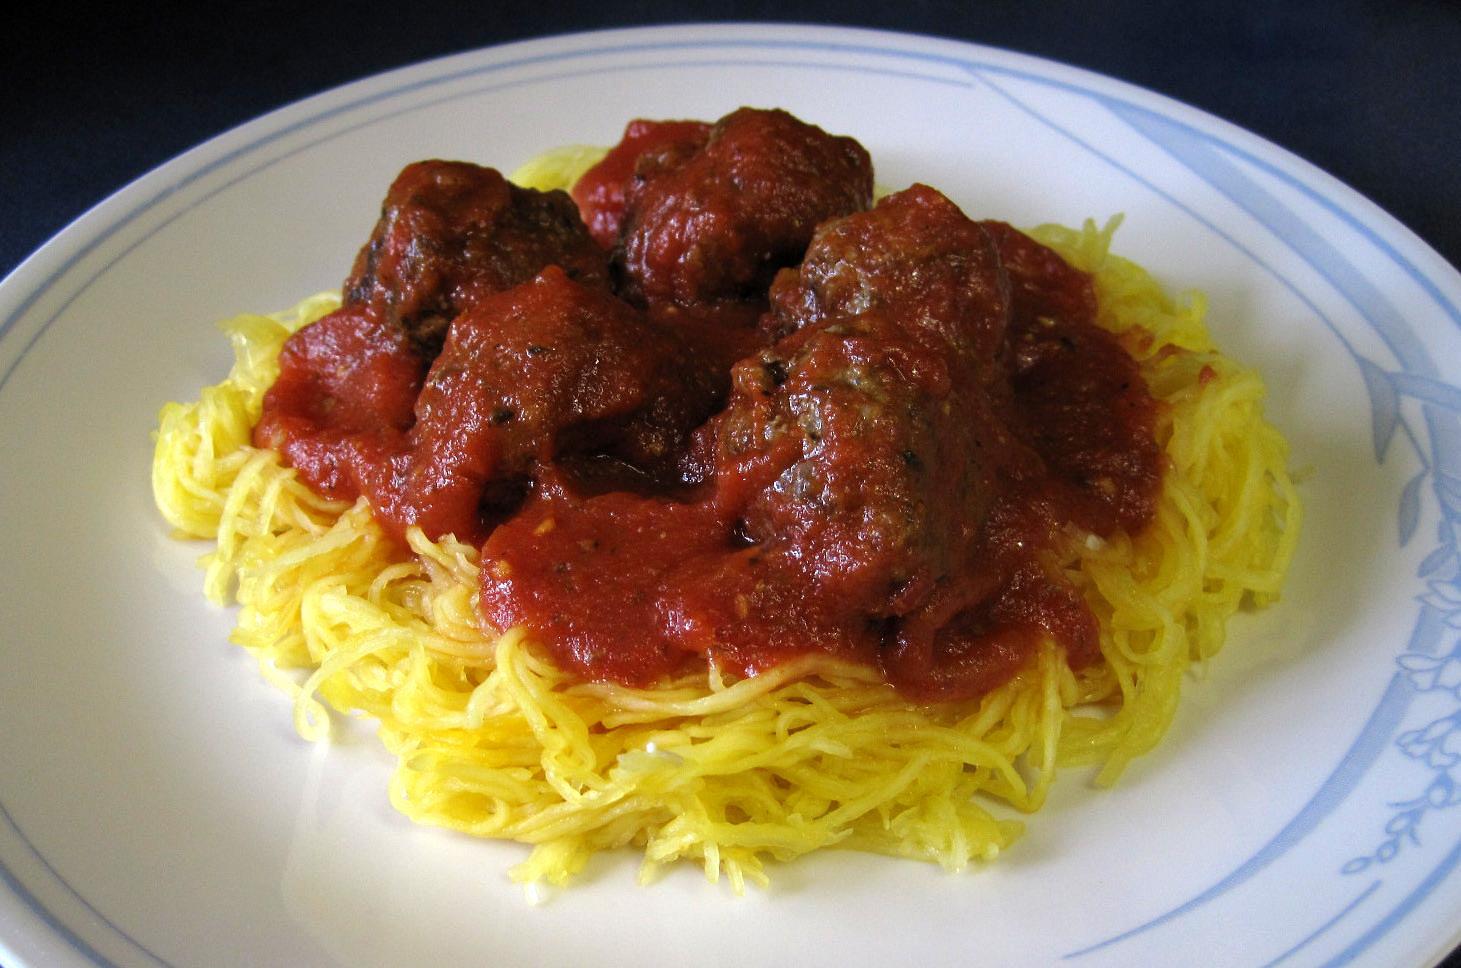 how to prepare spaghetti squash step by step